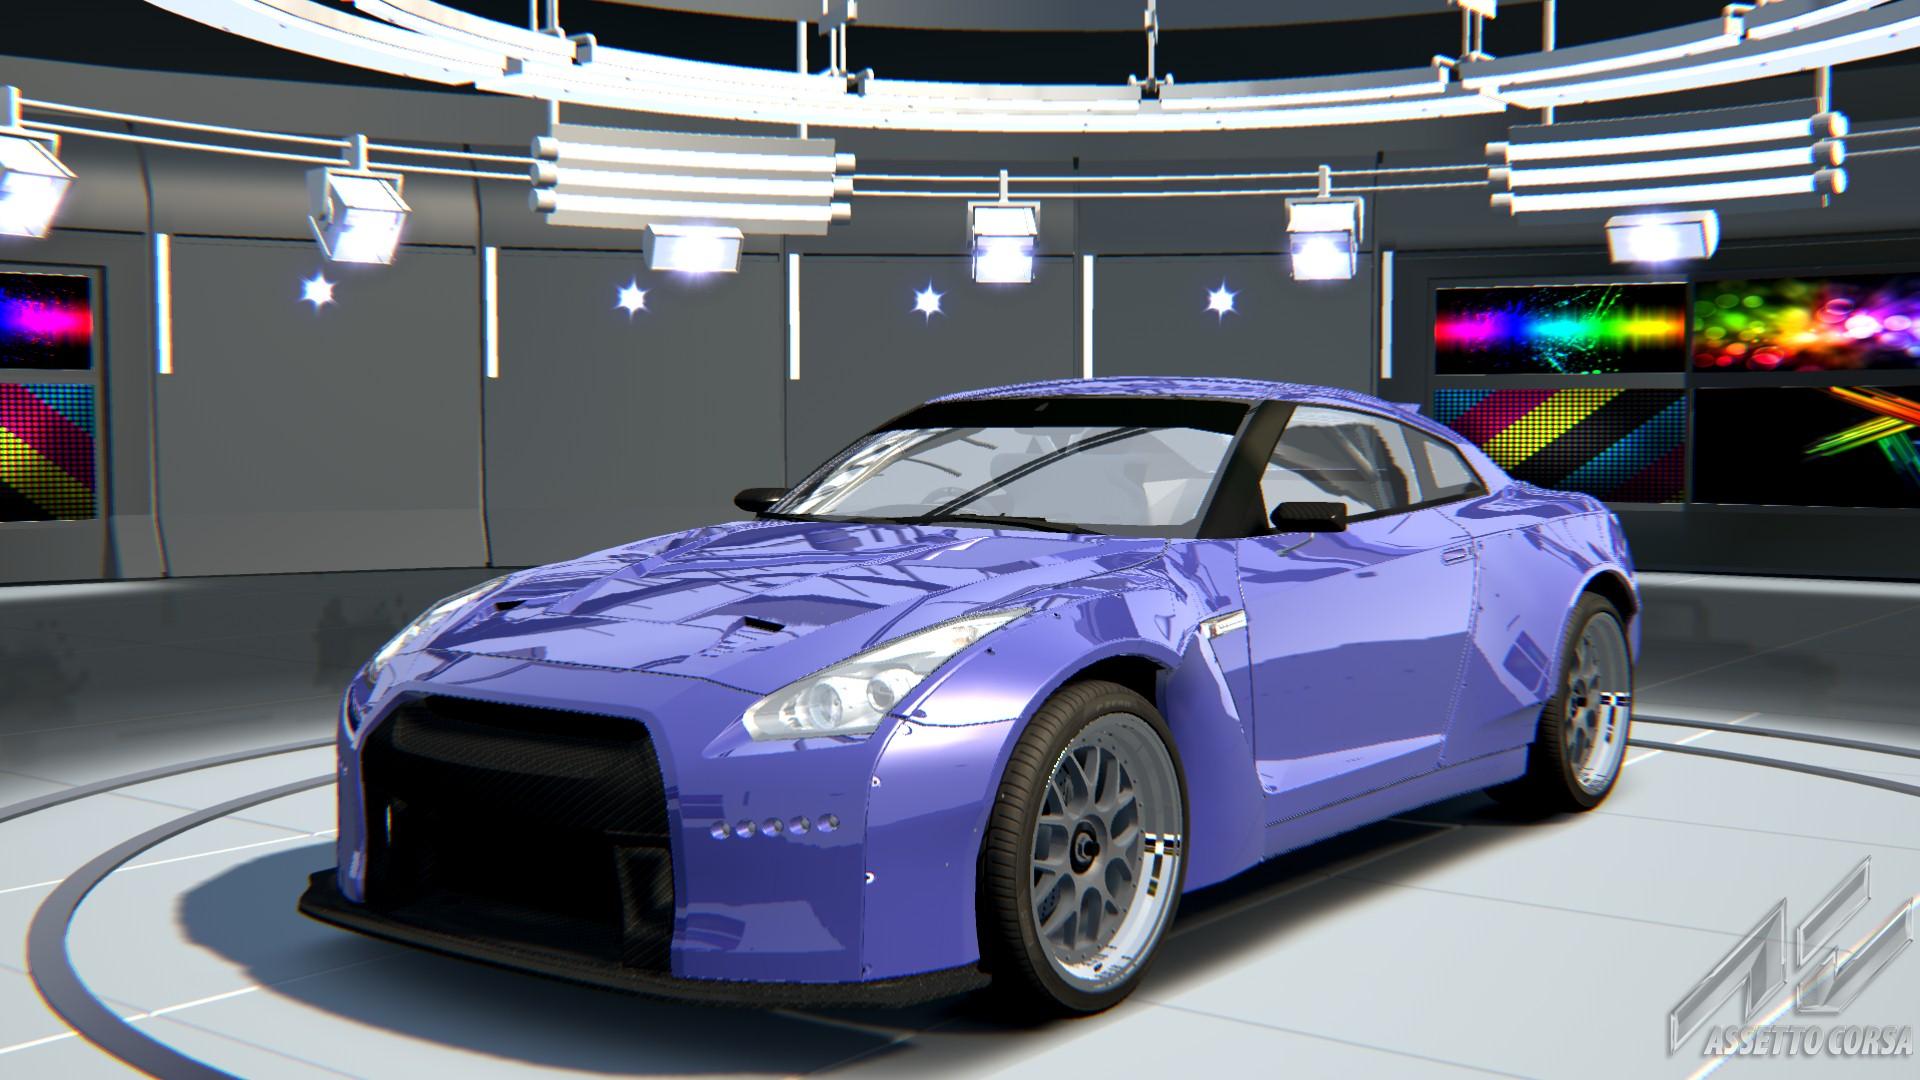 Nissan Gt-r Rocket Bunny - Nissan - Car Detail